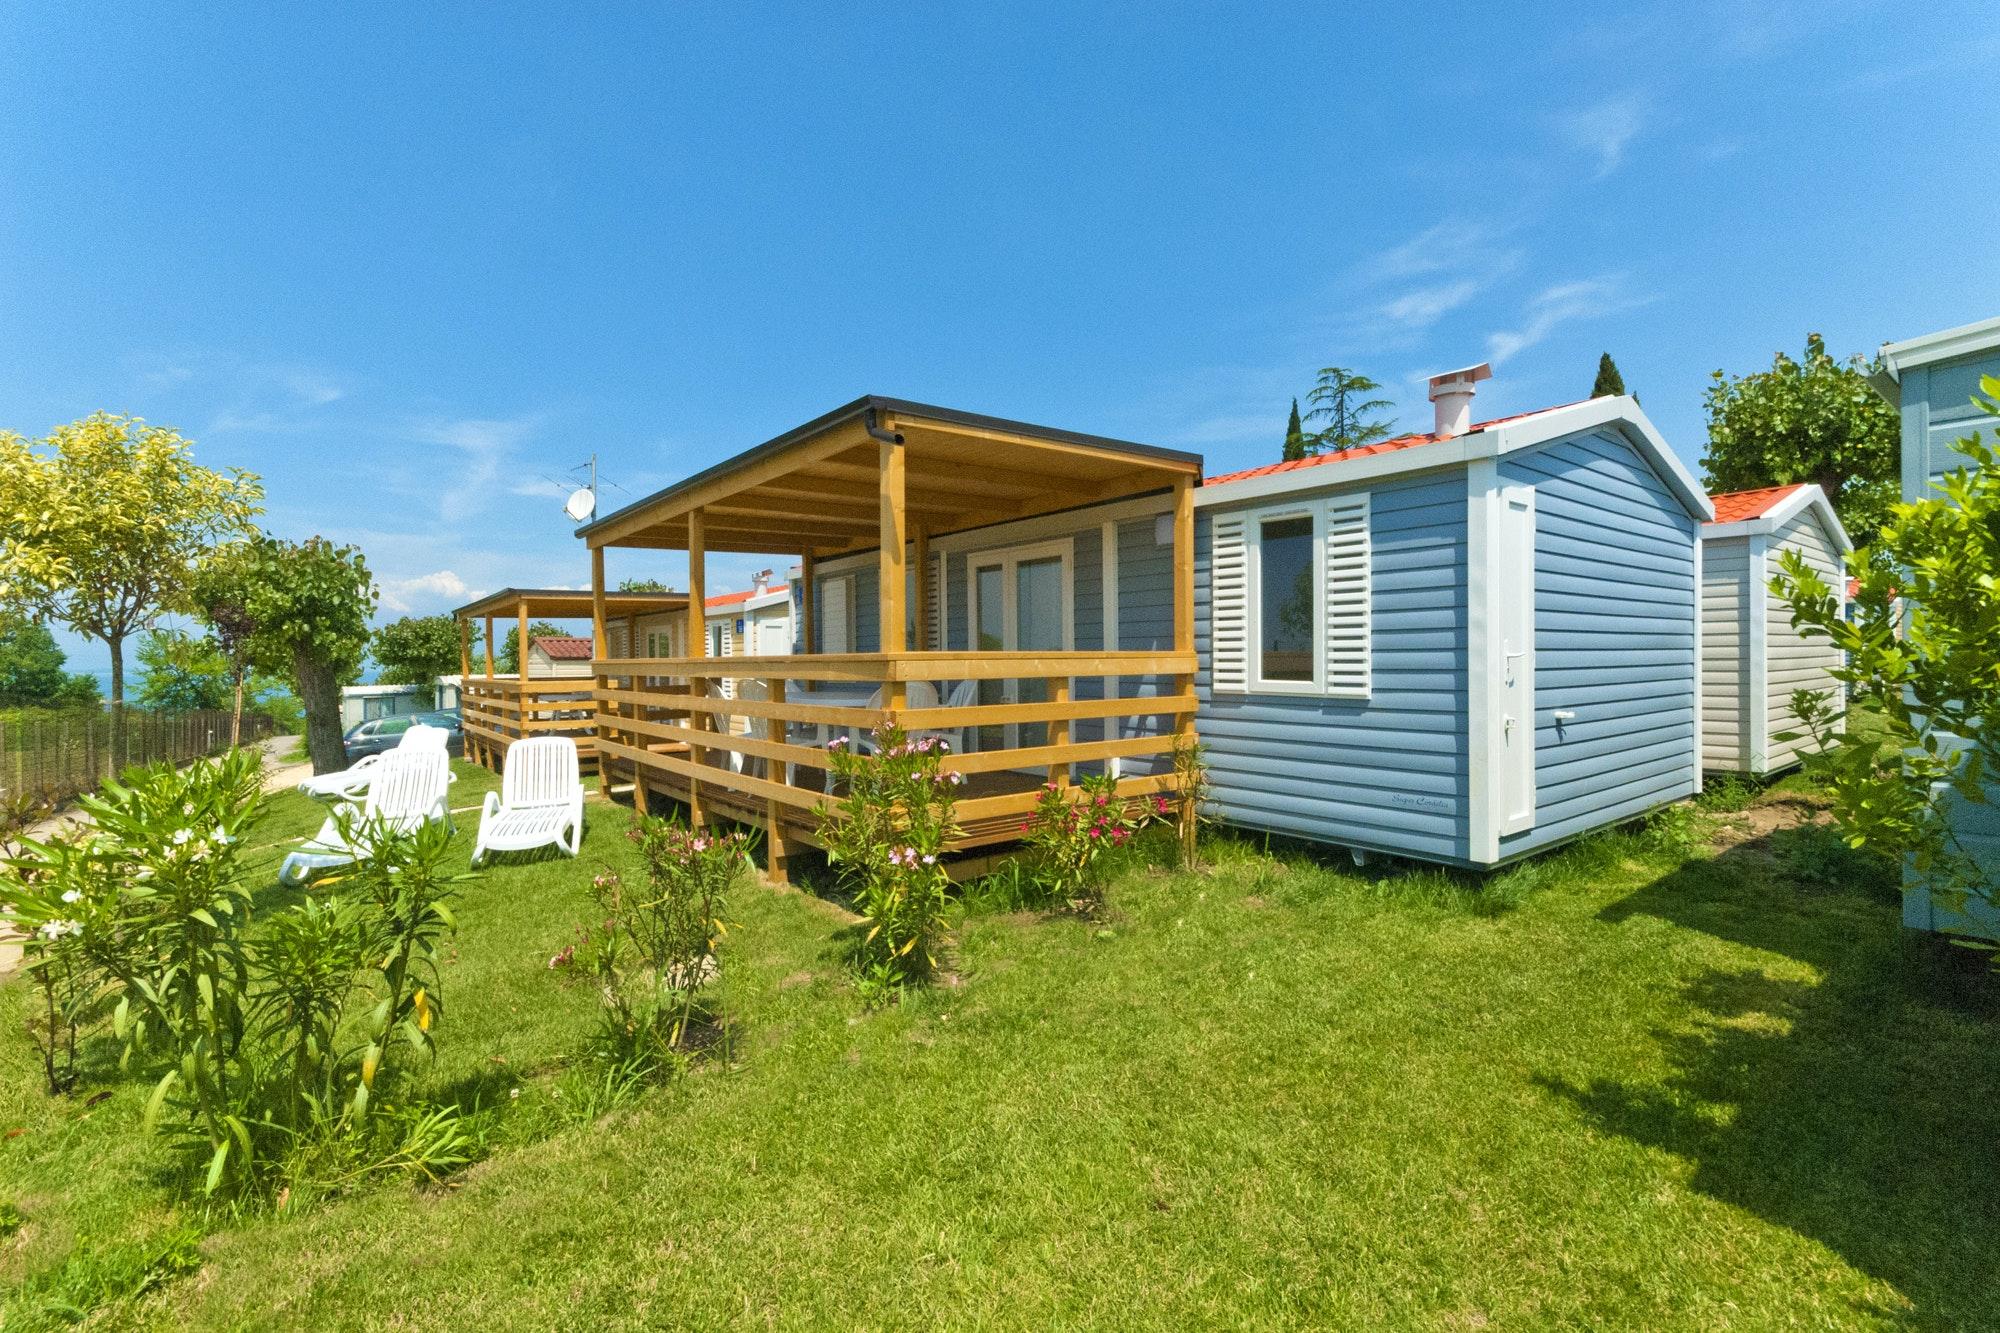 adac camping mobilheim gardasee camping piantelle pincamp. Black Bedroom Furniture Sets. Home Design Ideas